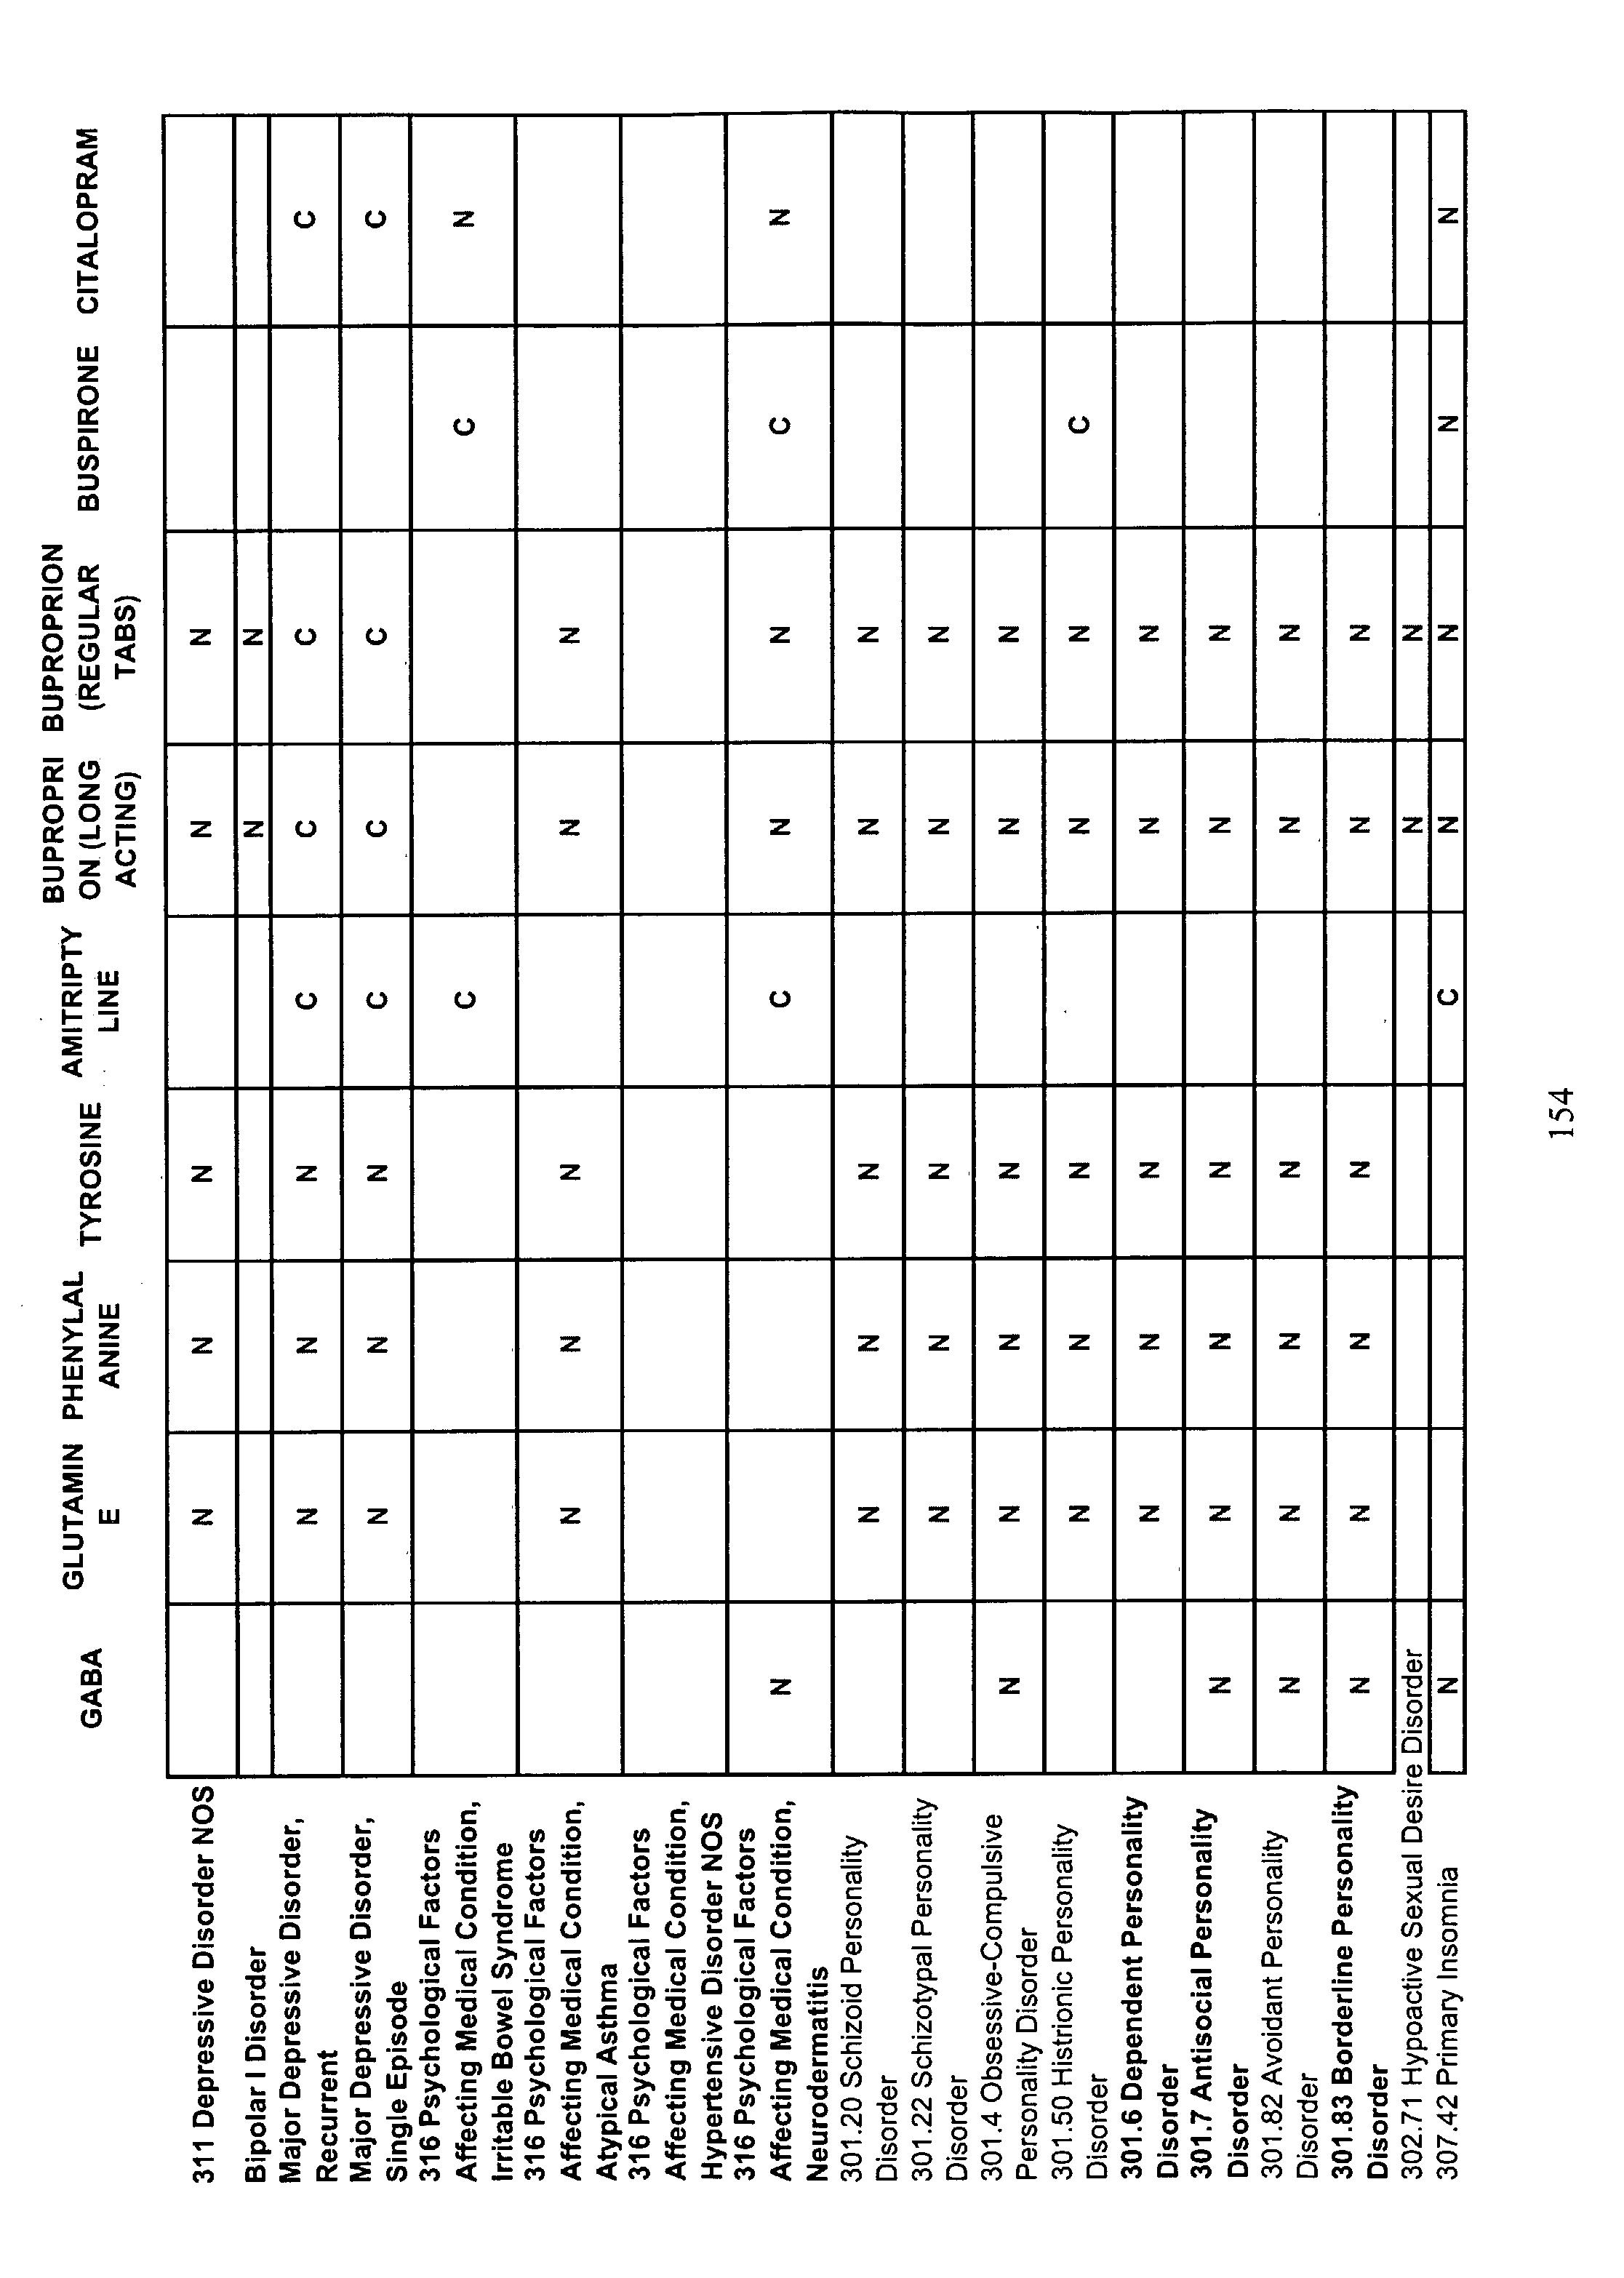 Figure US20030135128A1-20030717-P00025